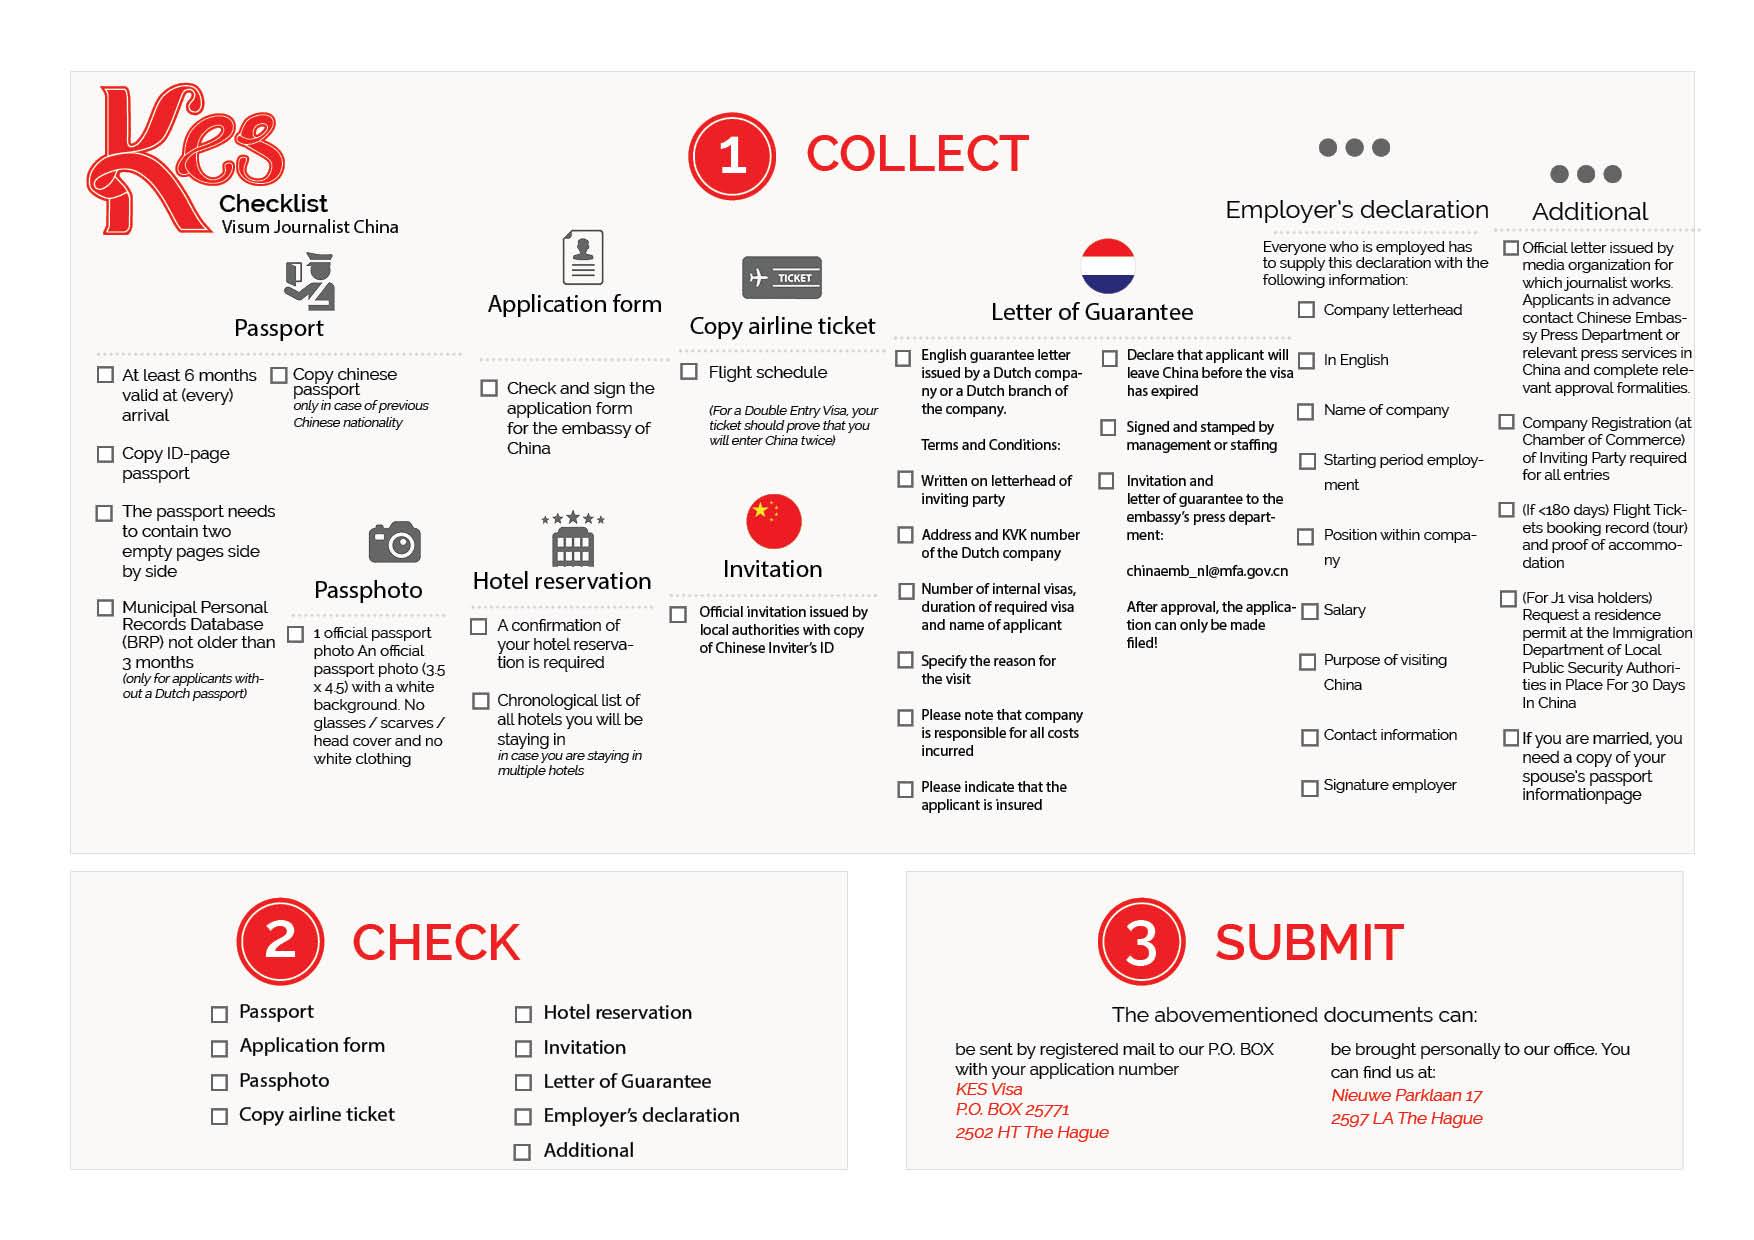 china_journalist%20EN%283%29 Visa Application Form Turkey Download on turkey visa requirements, turkey tourism, turkey tourist visa, turkey electronic visa number, turkey visa fee,